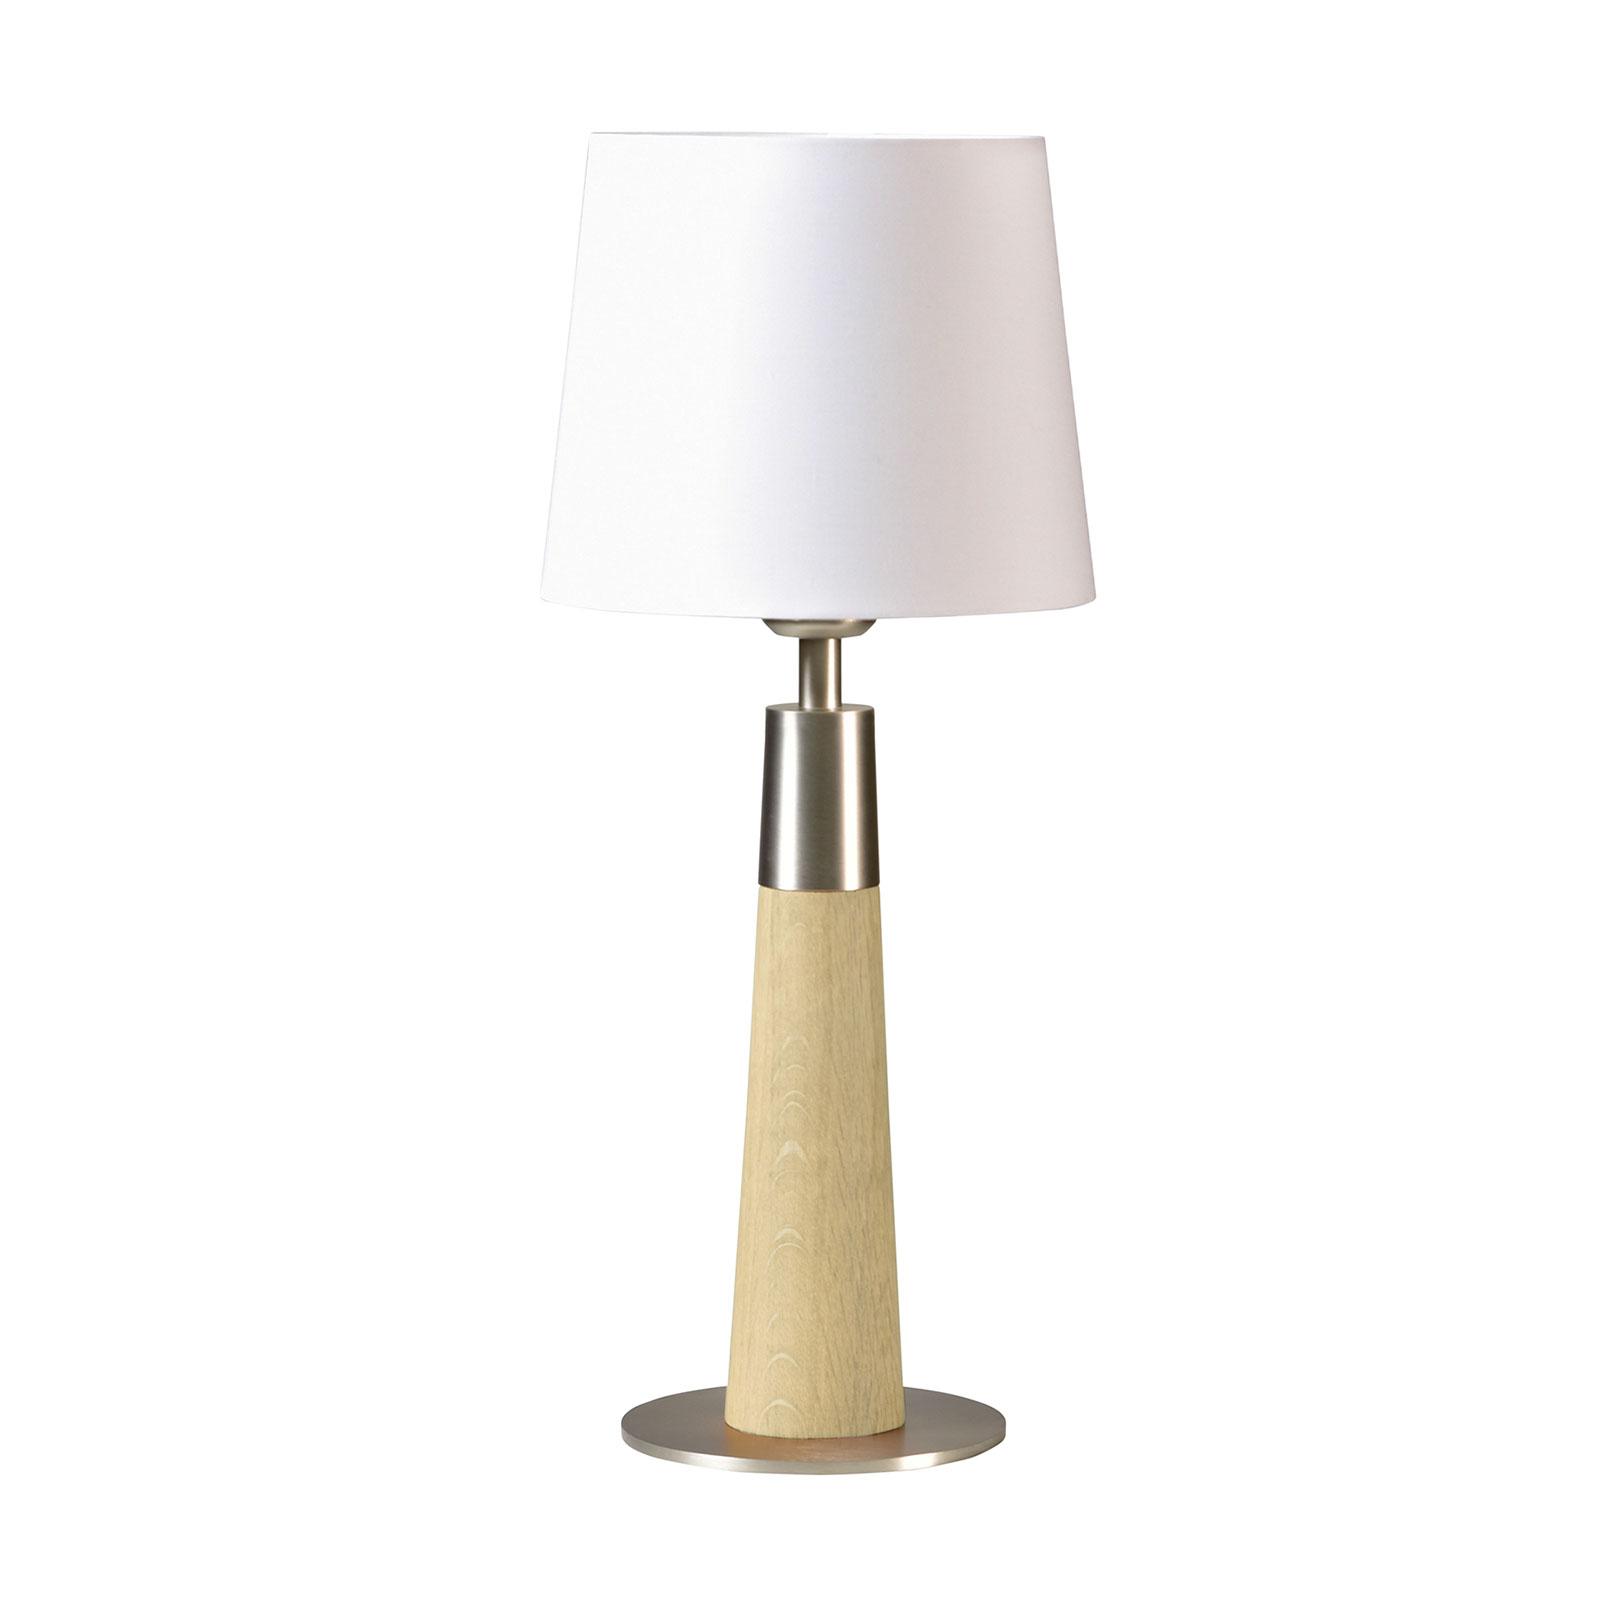 HerzBlut Conico bordlampe hvid, naturlig eg, 44 cm